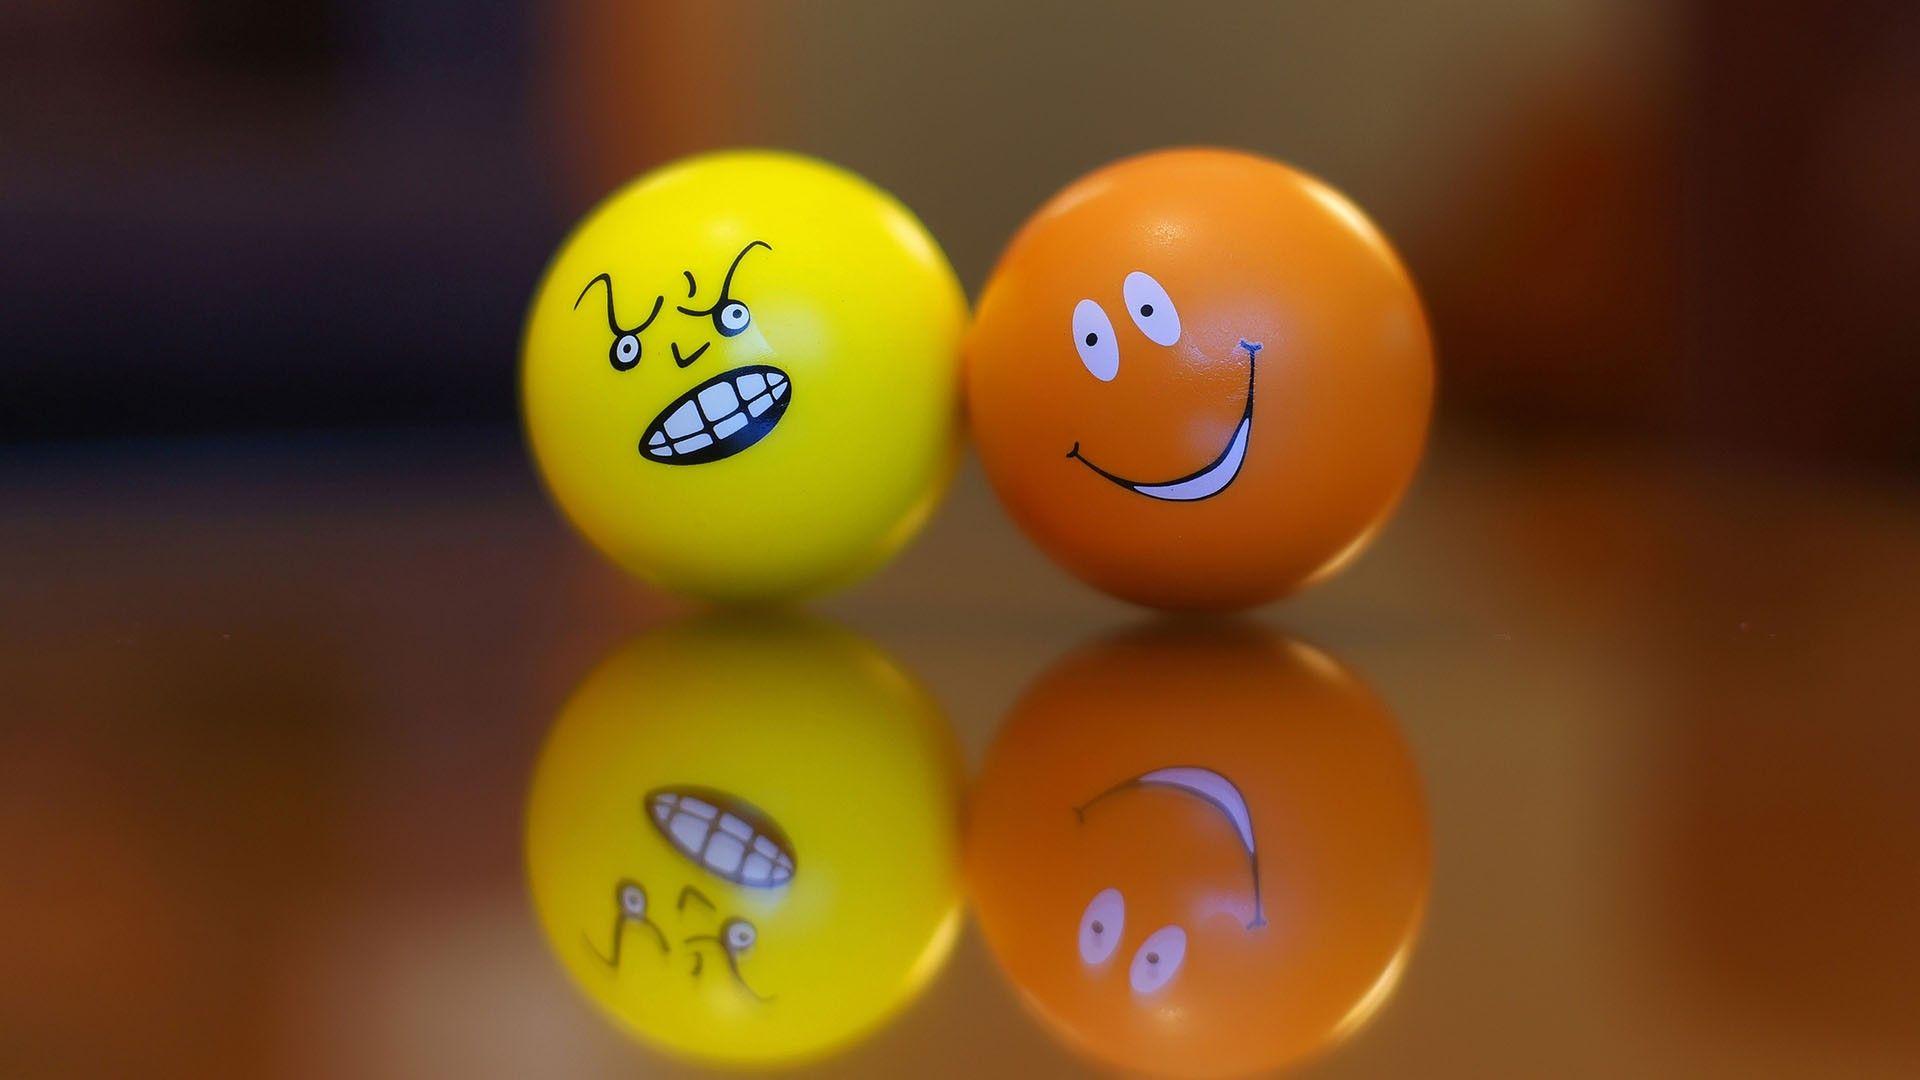 Download smiley face wallpaper hd wallpaper - Smiley Emoticons Hd 1080p Wallpapers Download